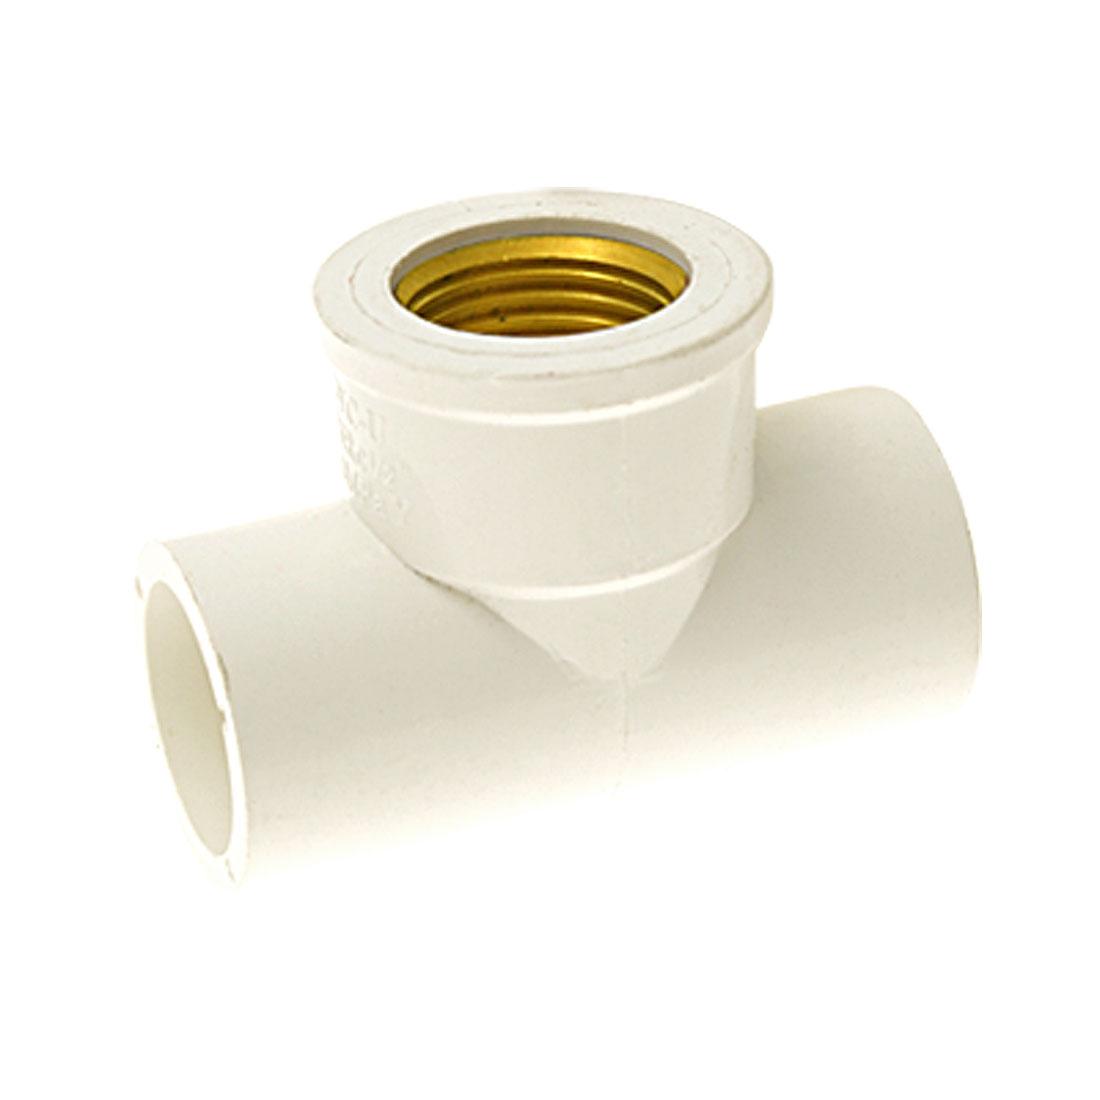 19mm Screw Socket Three Way PVC Water Pipe Tee Adapter